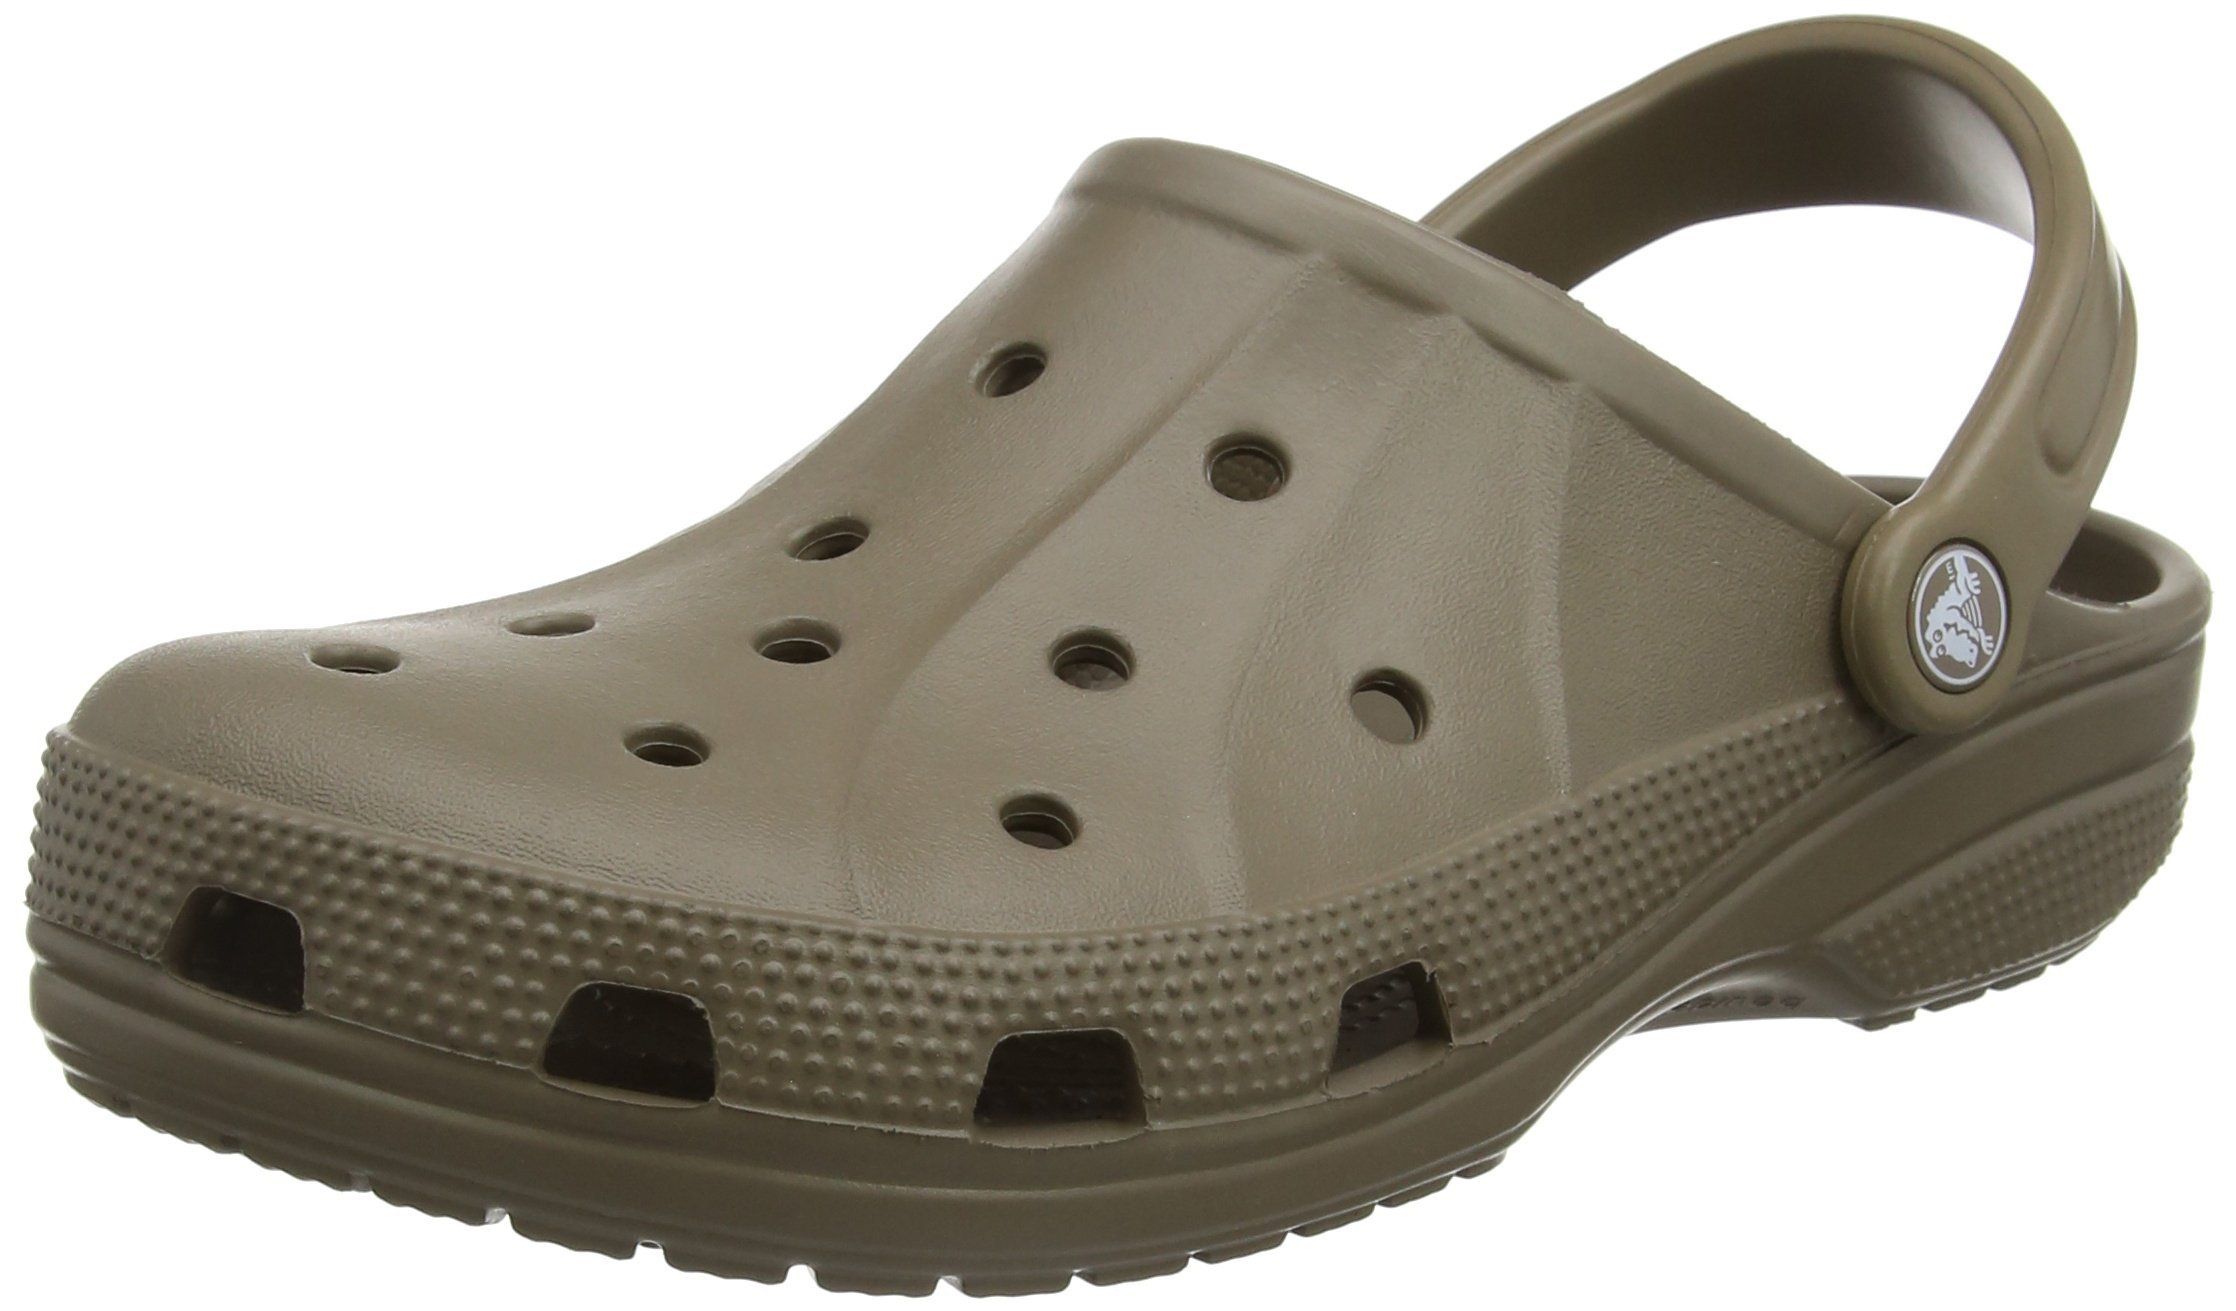 Crocs Ralen Clog Slingback Shoes, Walnut, Men's 8 US M/Women's 10 US M